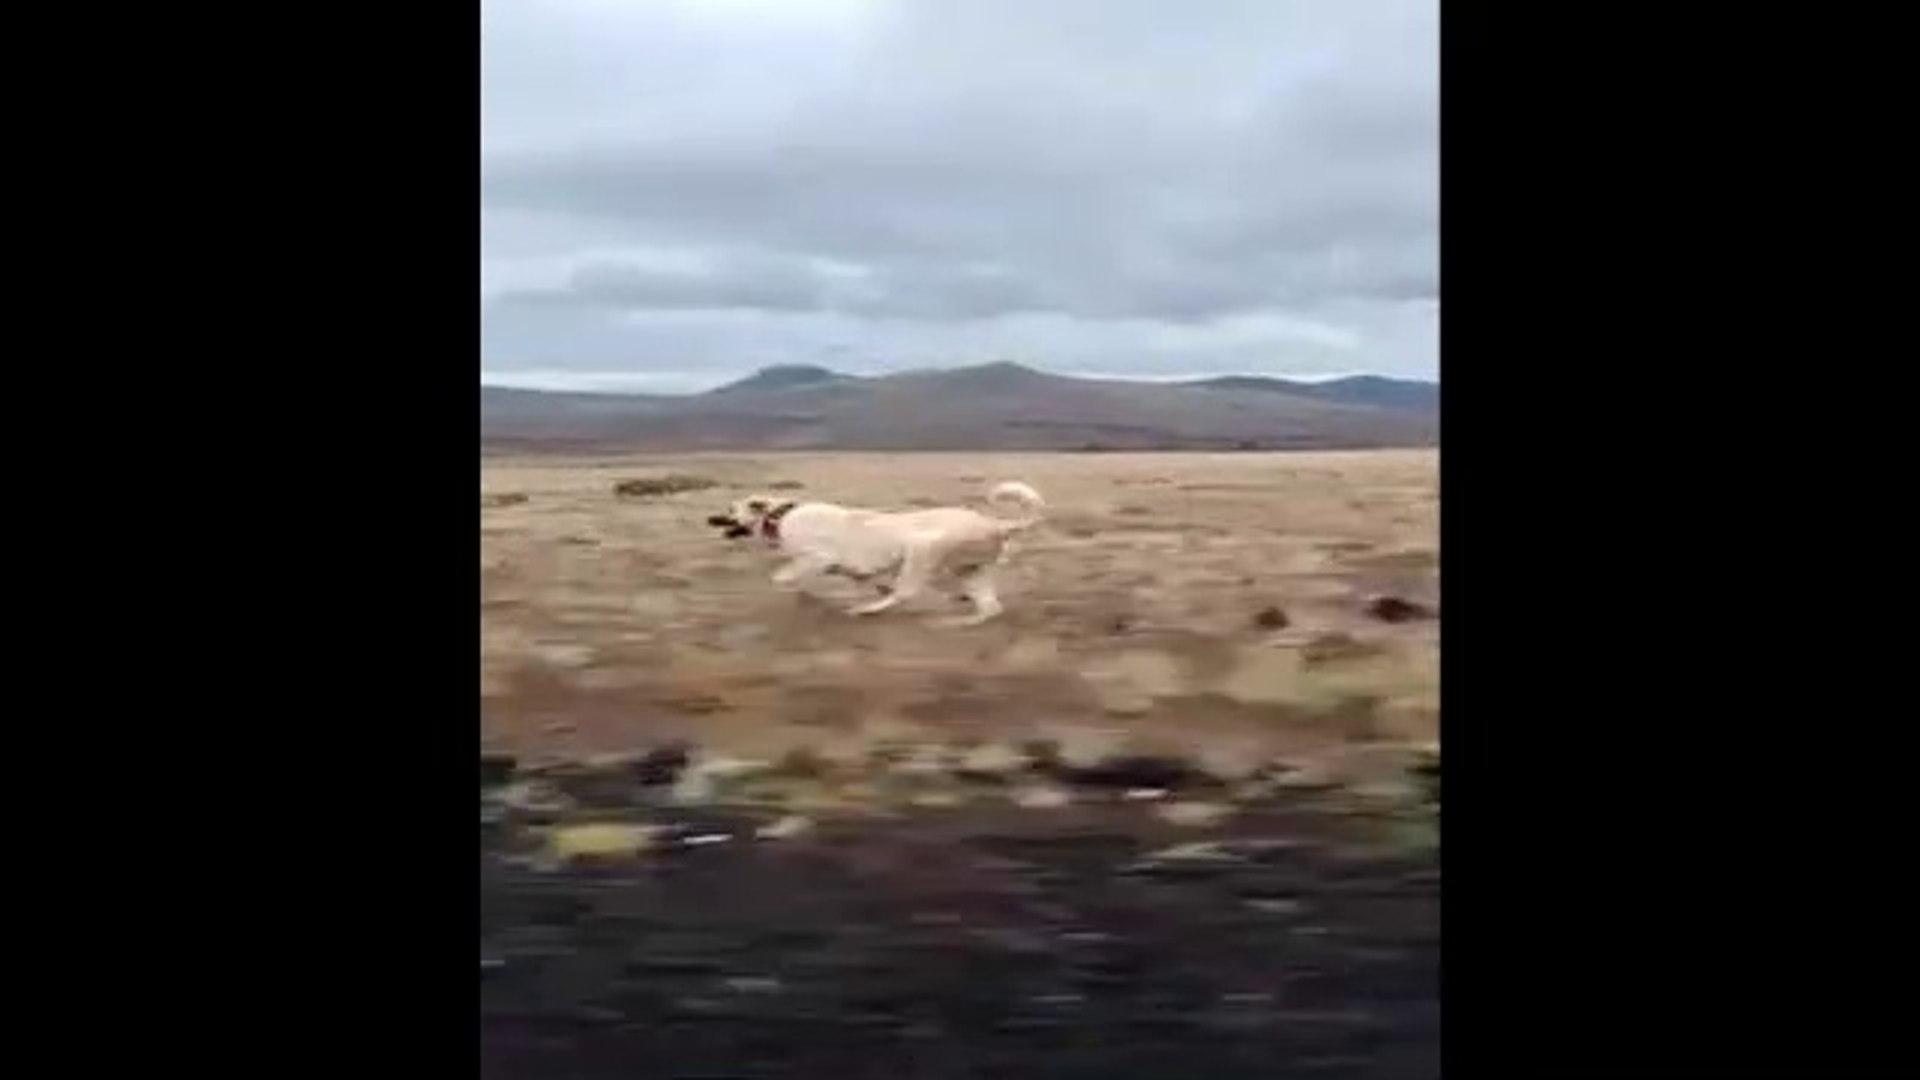 YARIS ATI MiSALi ANADOLU COBAN KOPEGi - ANATOLiAN SHEPHERD DOG EXERCiSE